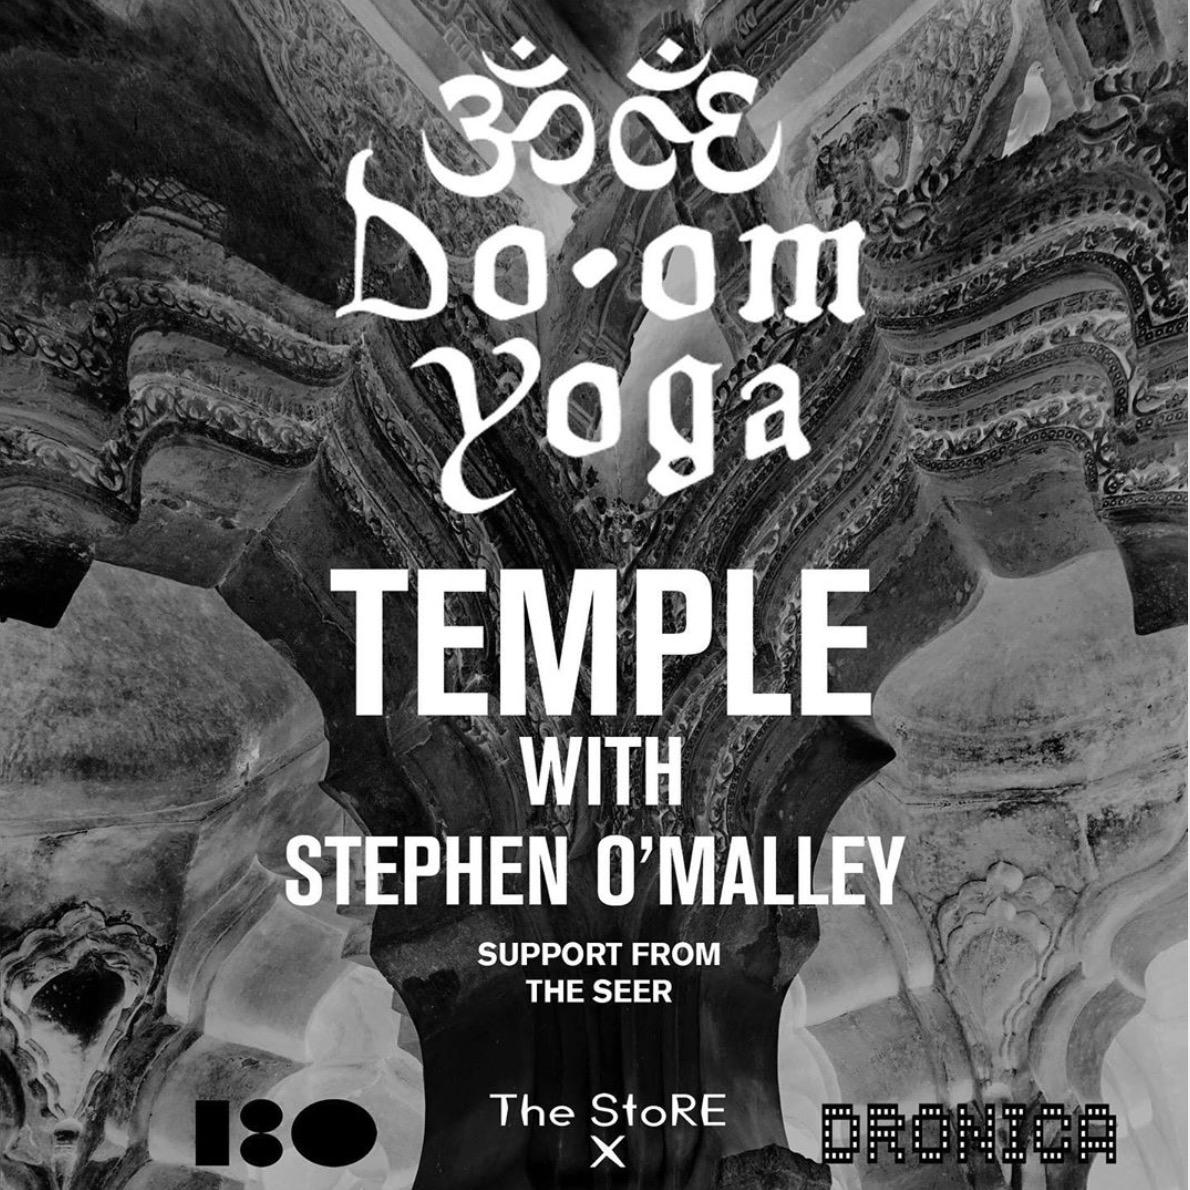 Stephen O'Malley (solo) @ do.om yoga  @ 180 The Strand